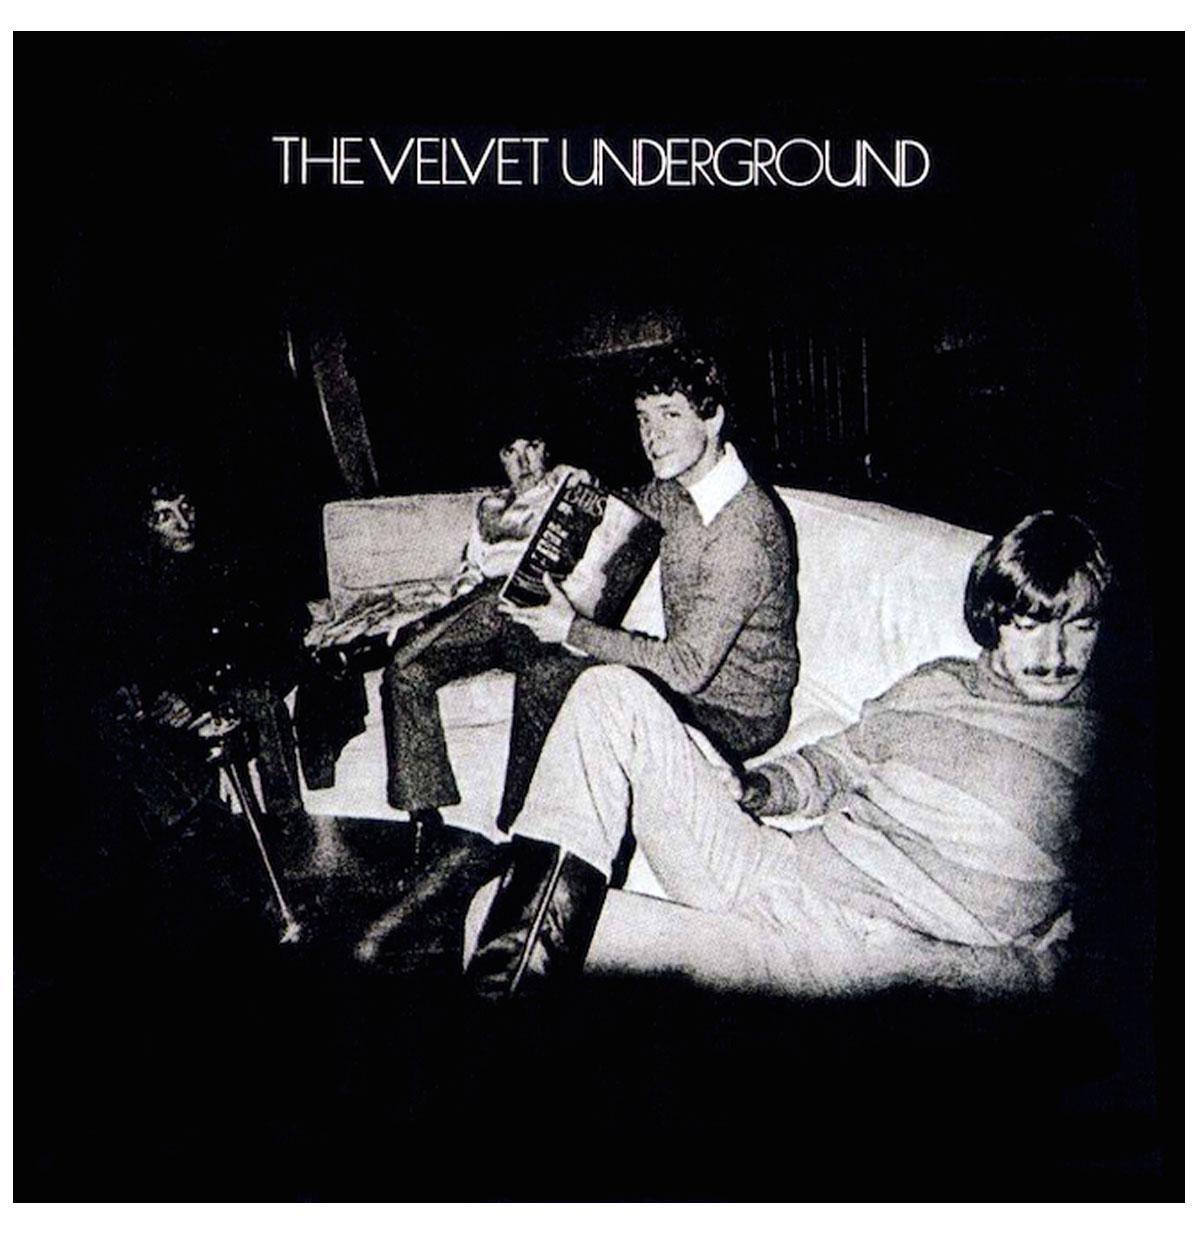 The Velvet Underground - Velvet Undergound LP